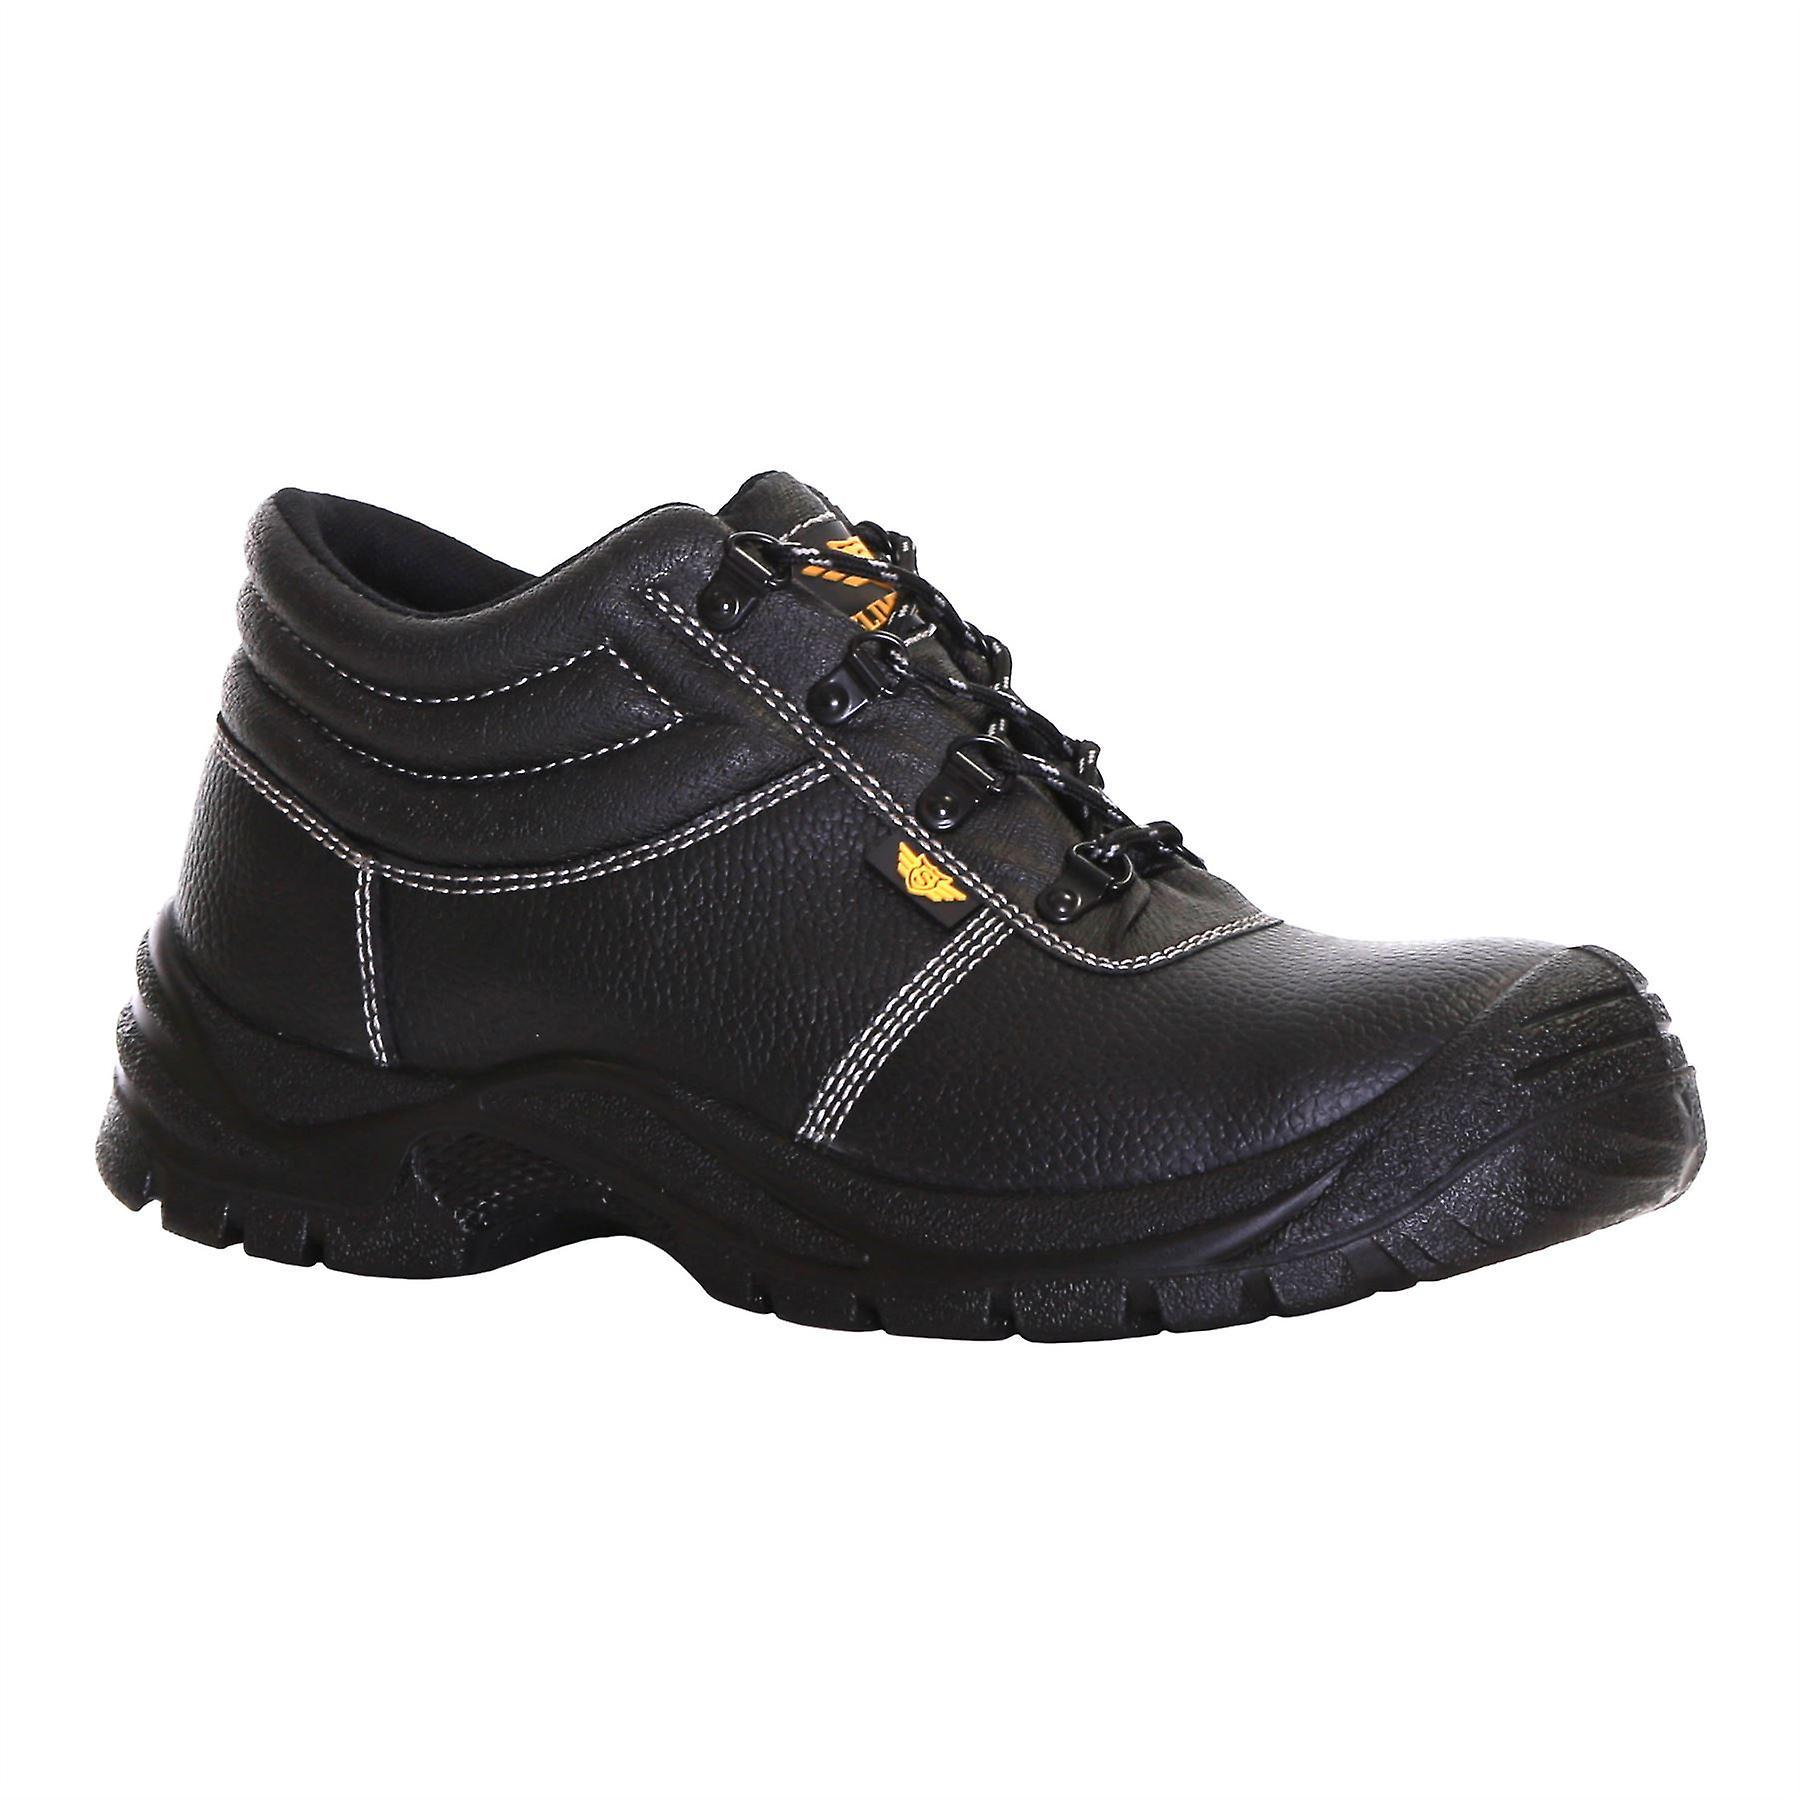 Slimbridge Thum Size 11 Safety Boots, Black